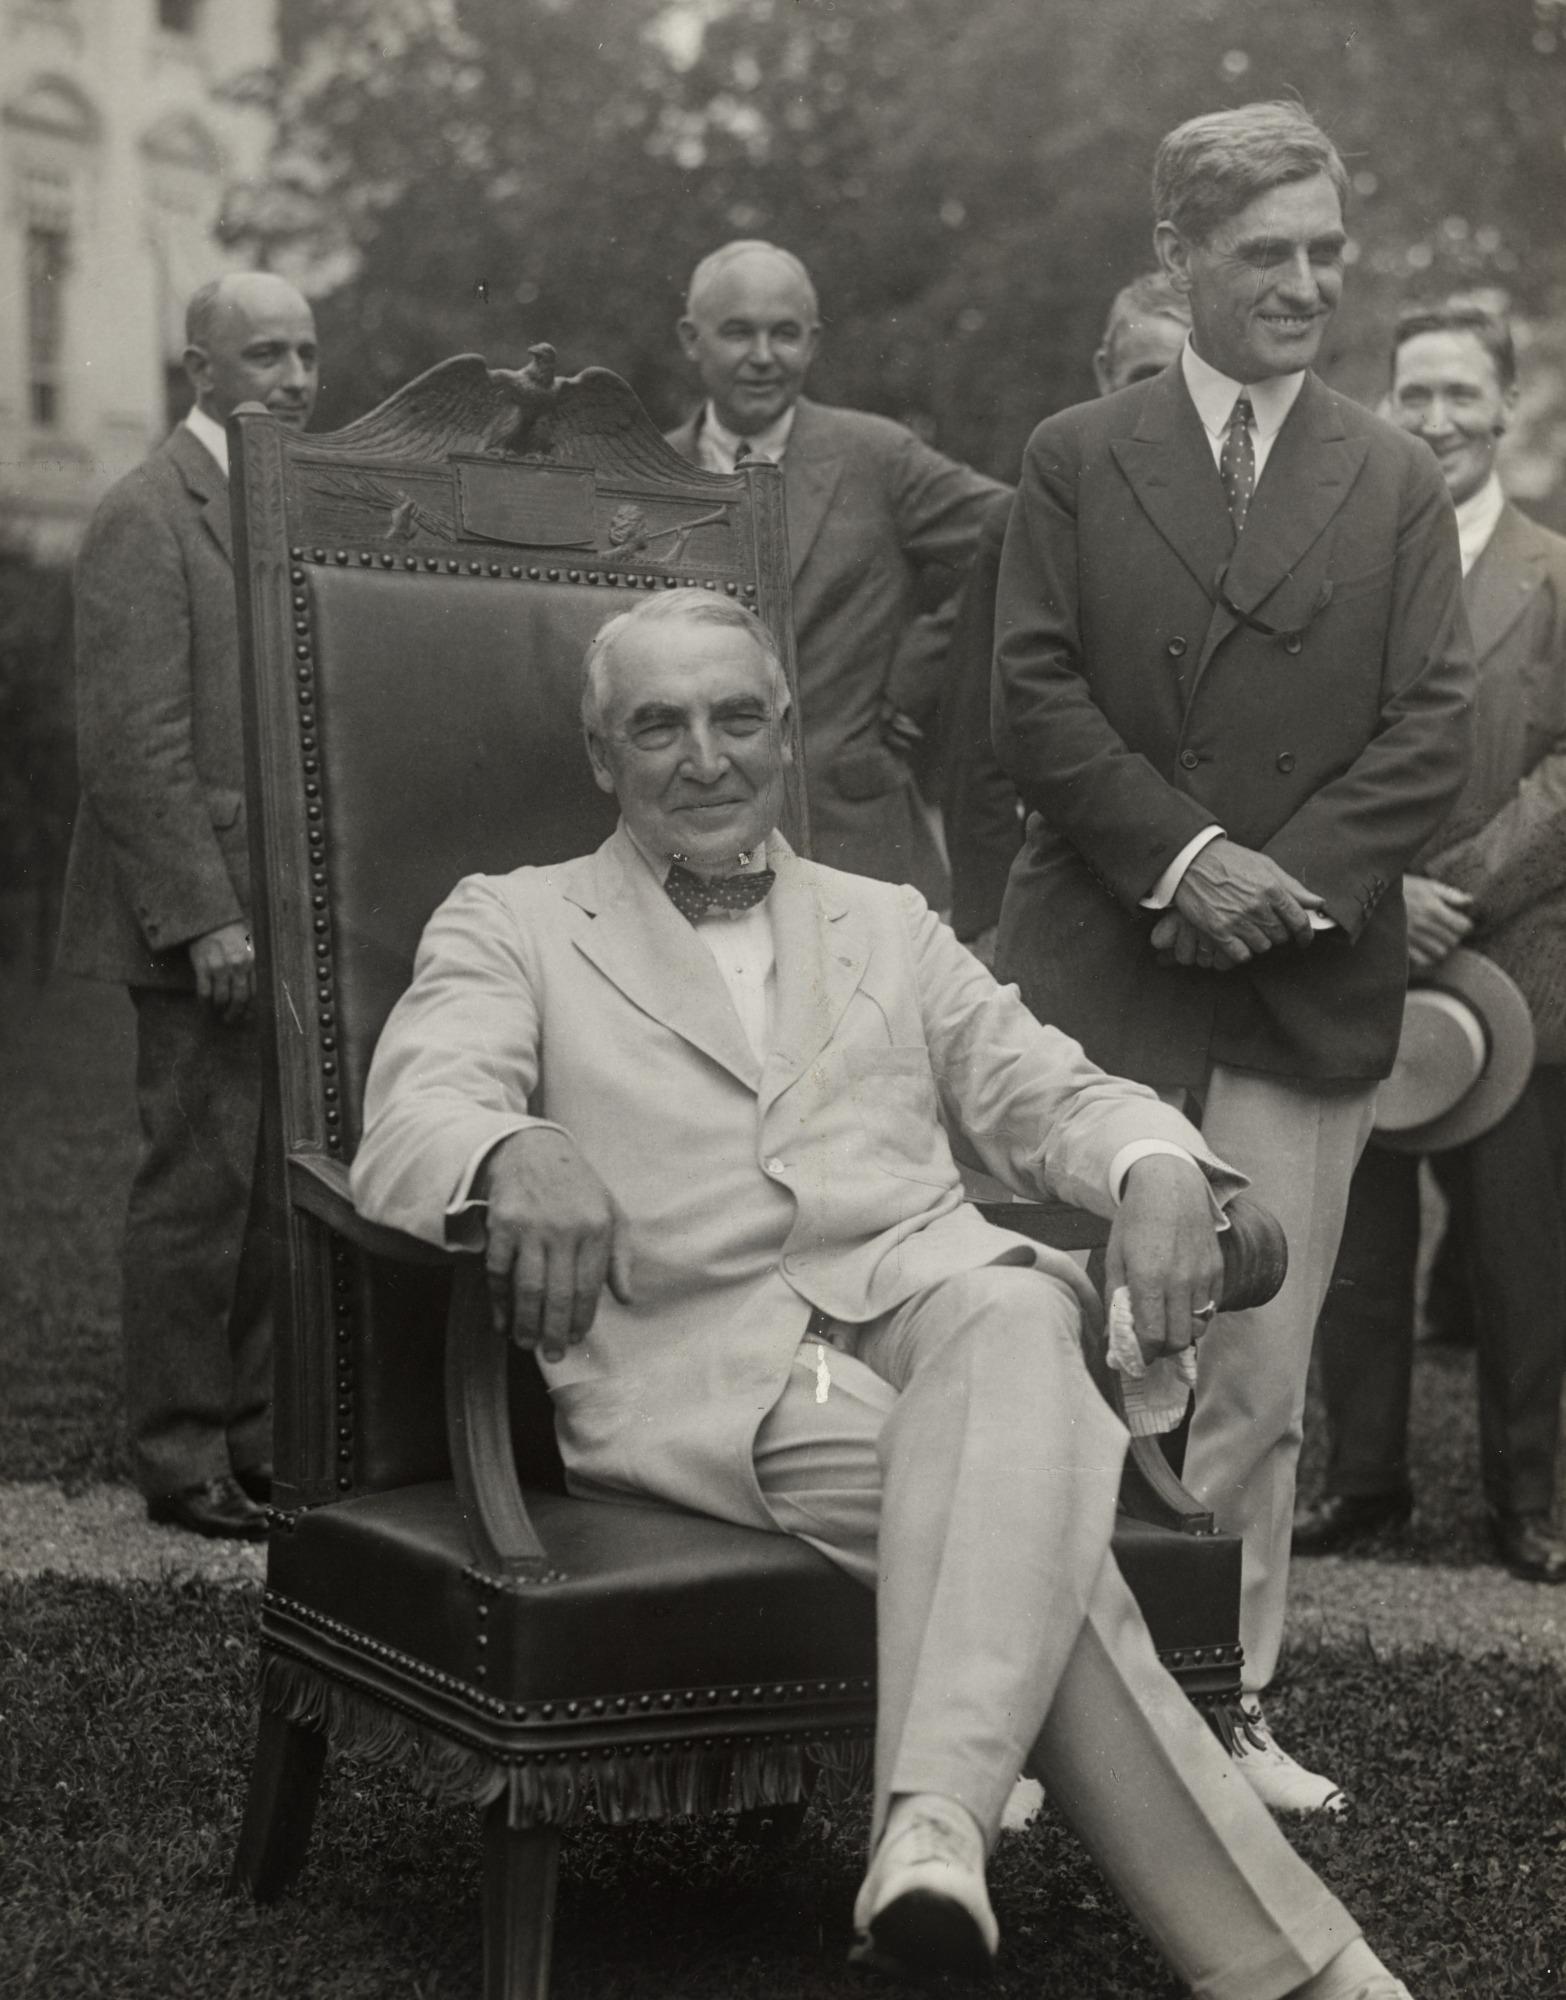 Tổng thống thứ 29 của My, Warren Harding. Ảnh: National Portrait Gallery